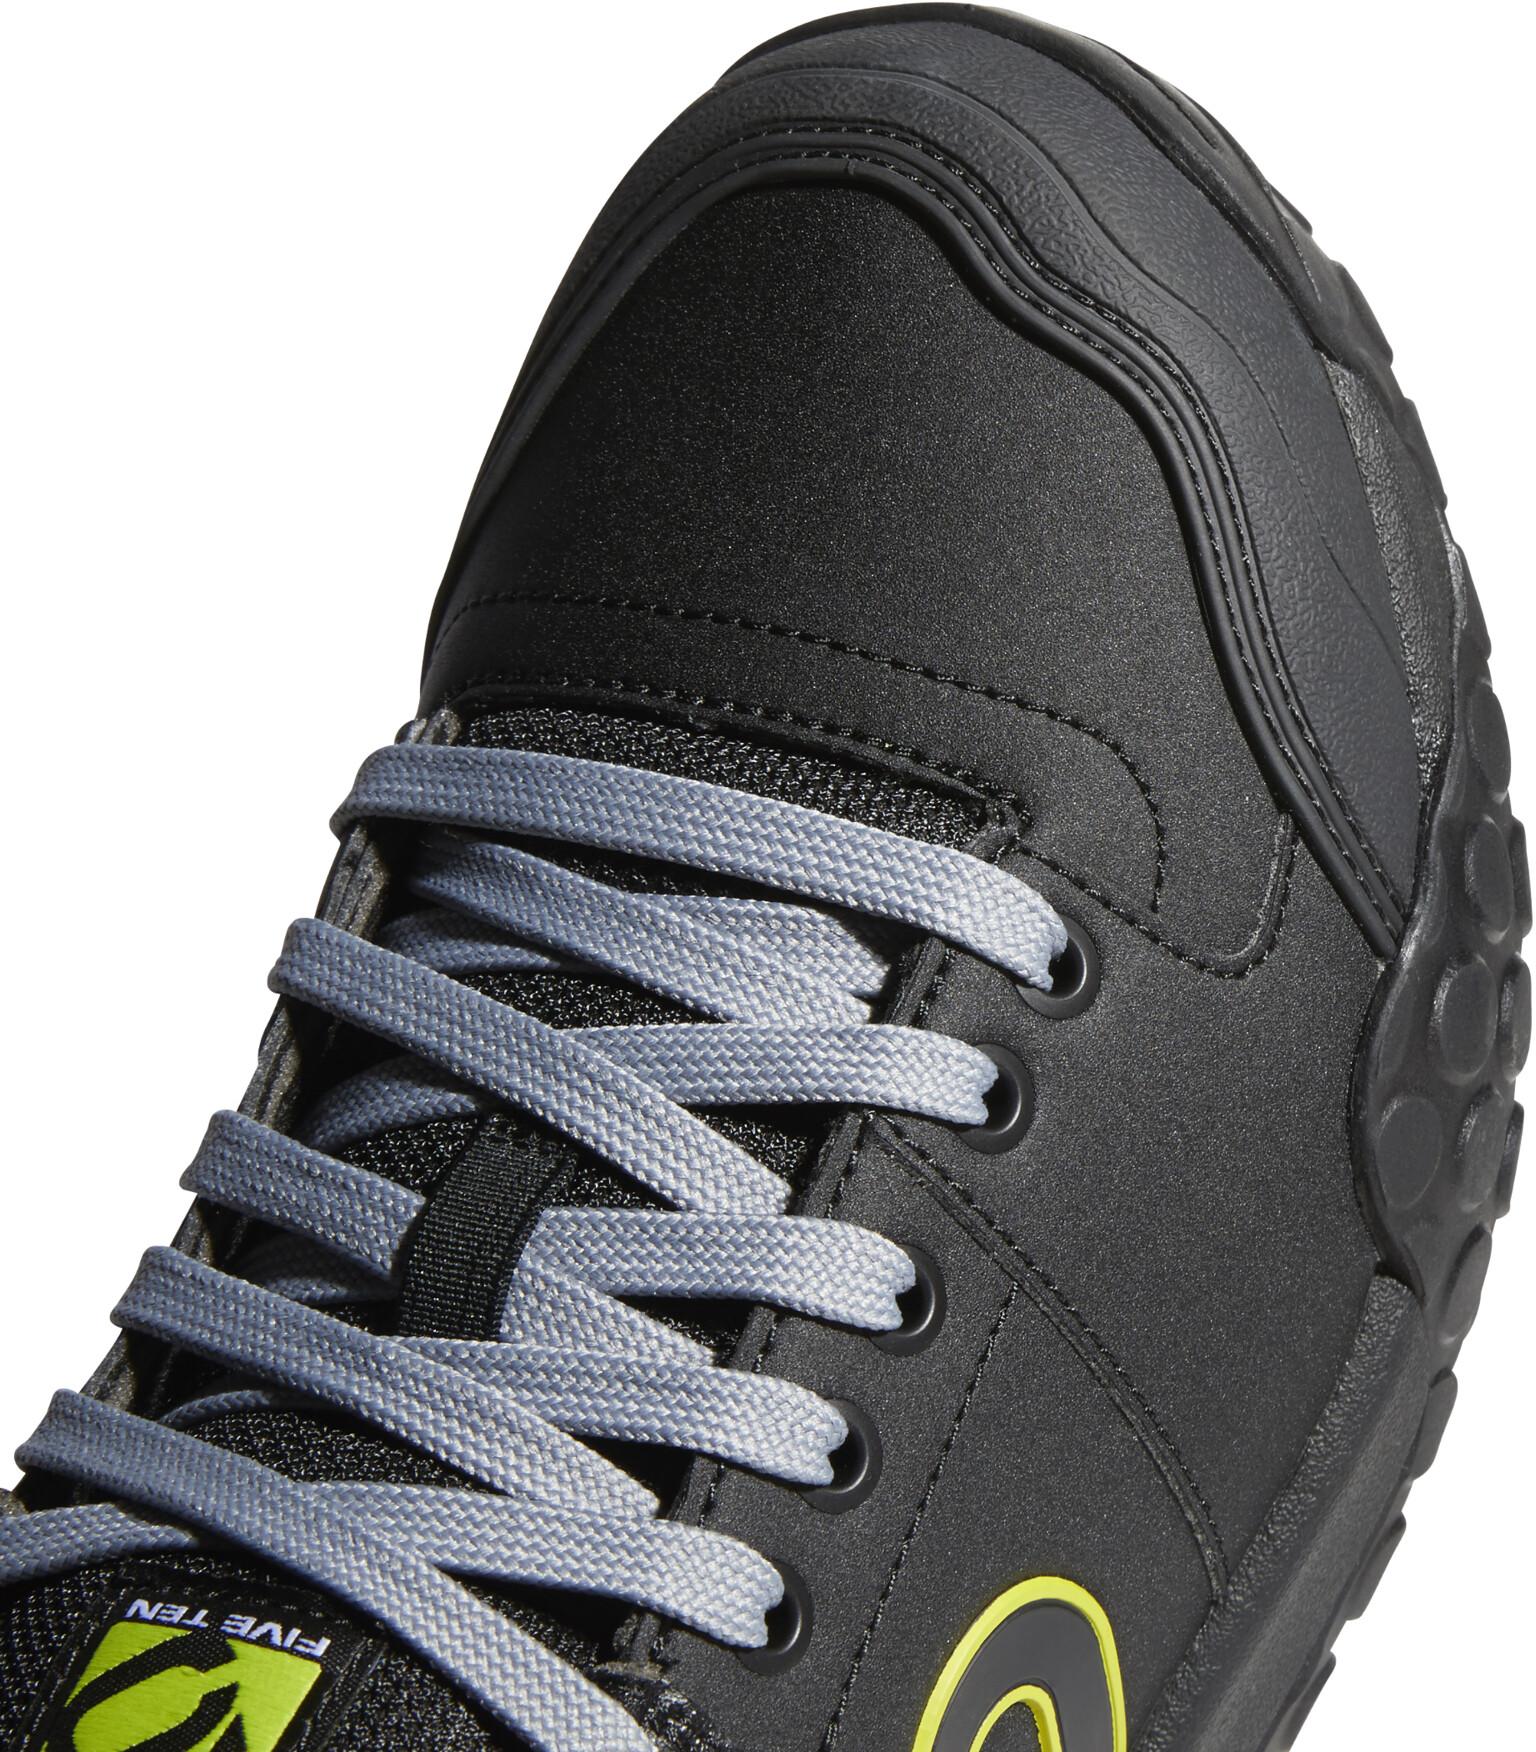 adidas Five Ten Impact Sam Hill Scarpe Uomo, core blackgreysesoye